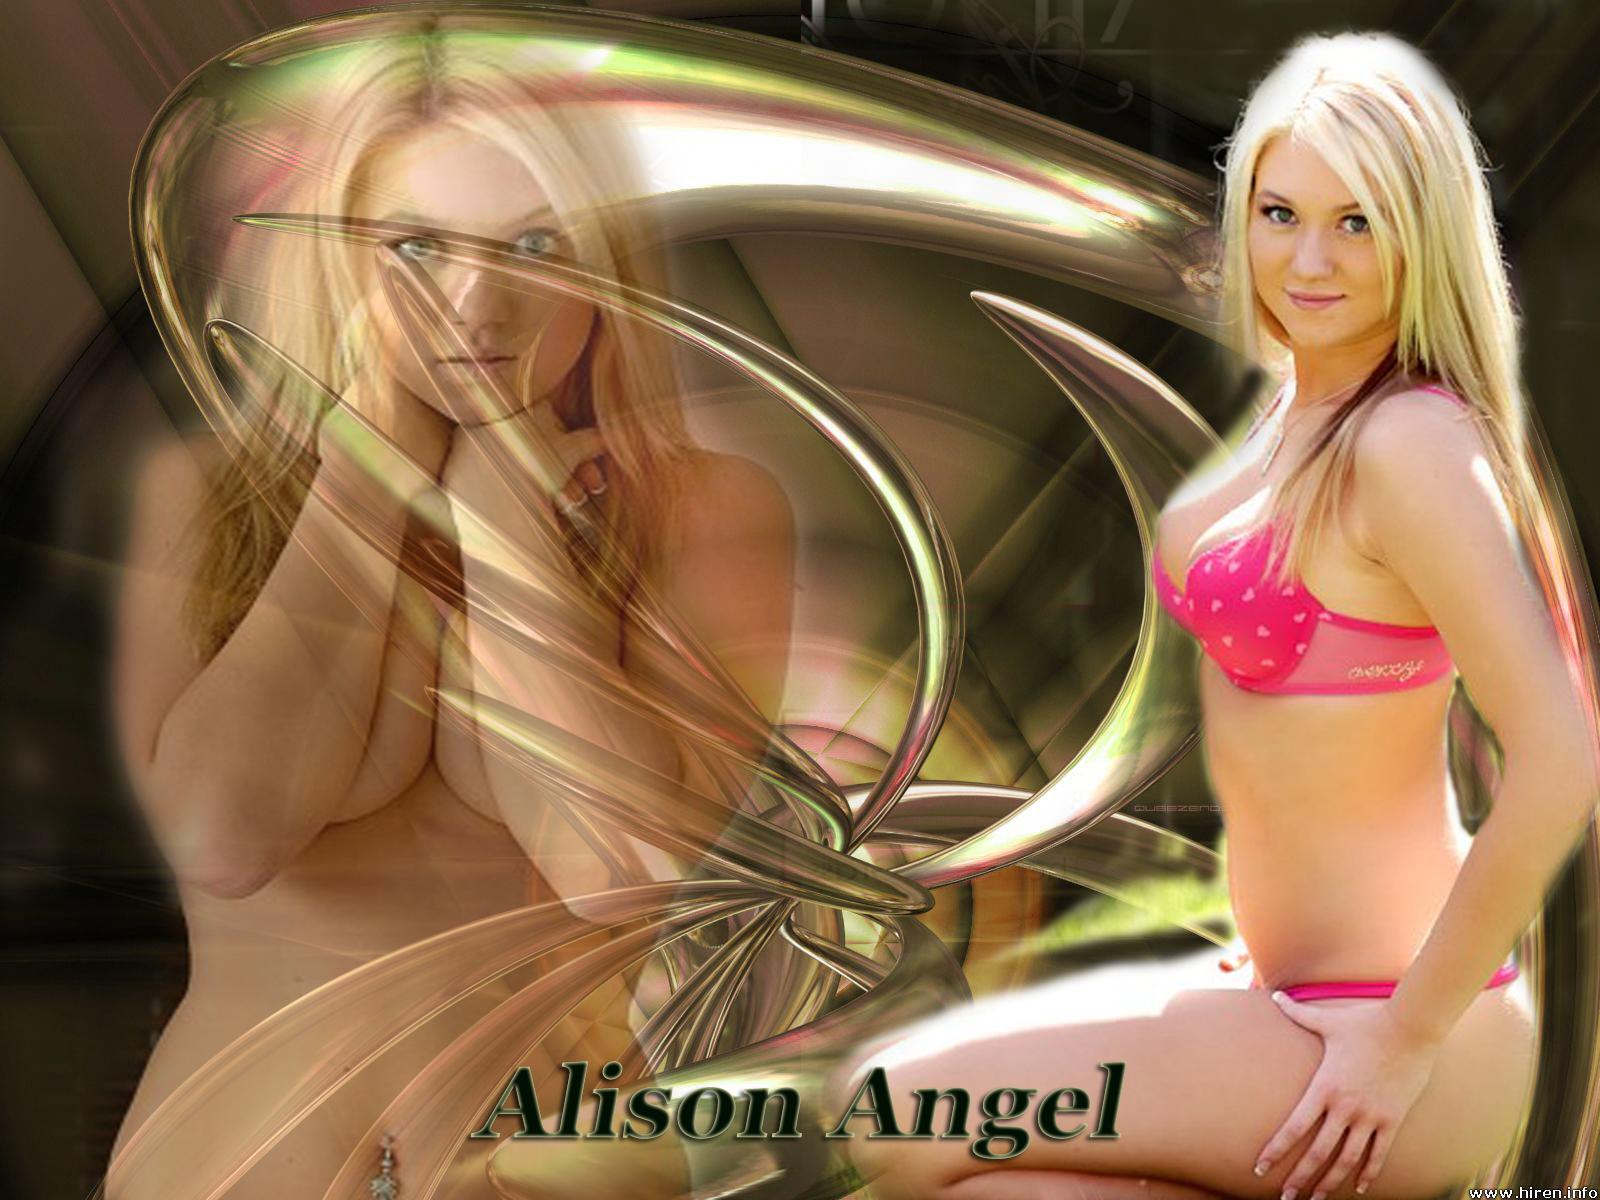 http://4.bp.blogspot.com/-IPadzRVcziM/TeoEFrJxXDI/AAAAAAAAAJc/-TeGY6TDCH4/s1600/Alison_Angel_39834.jpg